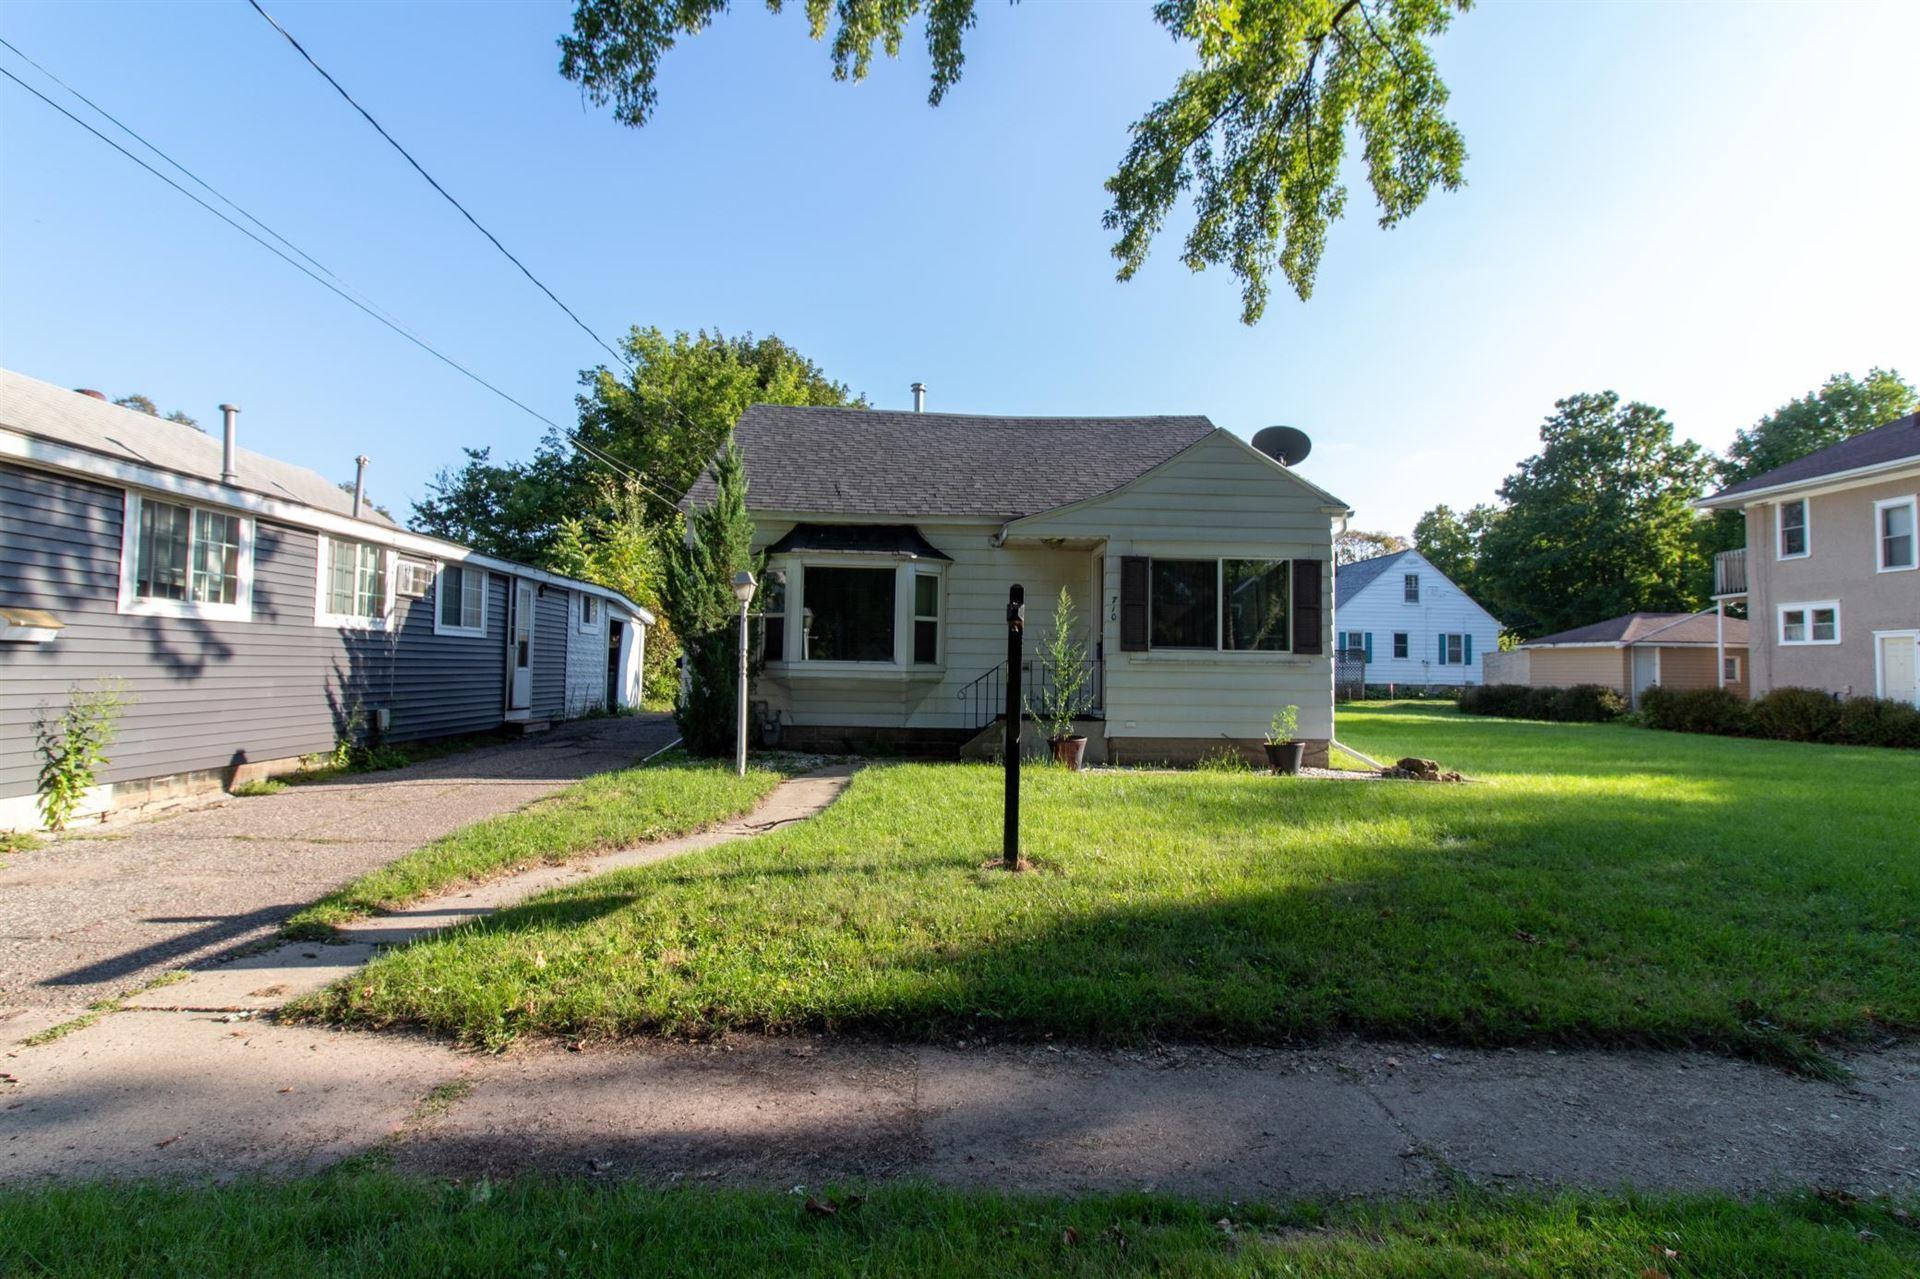 710 9th Street SE, Rochester, MN 55904 - MLS#: 5619891